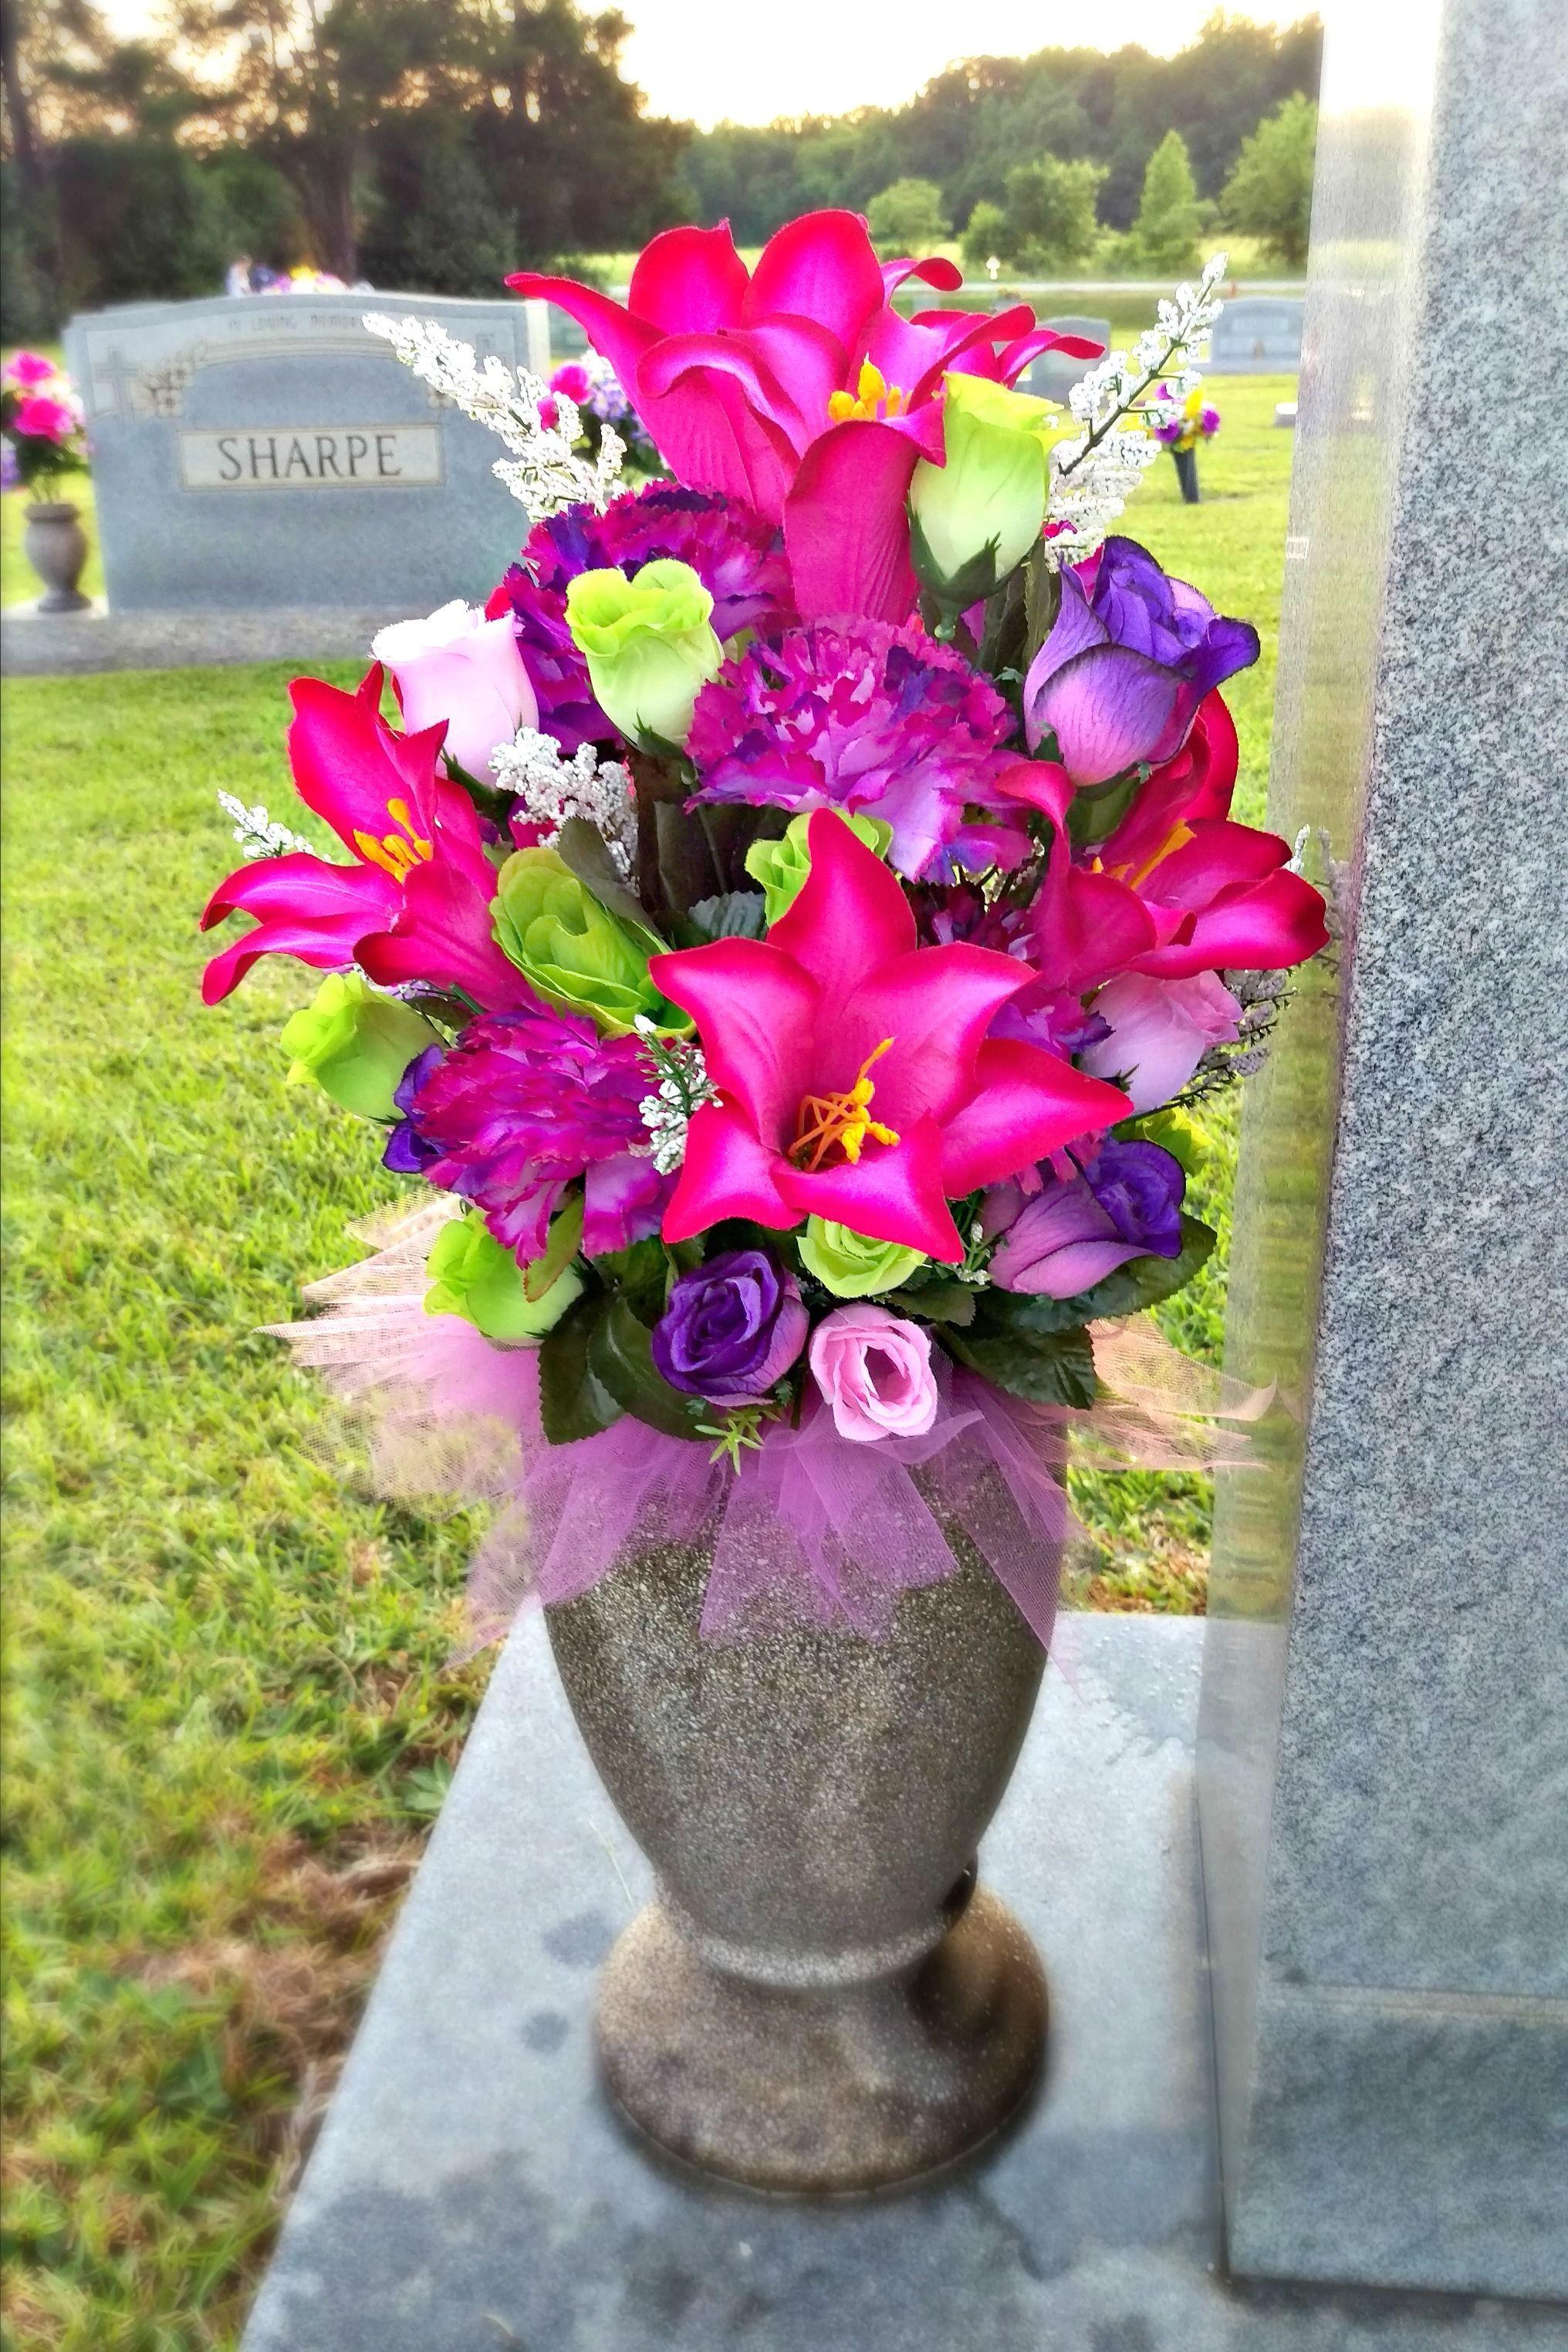 plastic flower vase inserts of stay in the vase cemetery flowers intended for spring summer cemetery vase arrangement